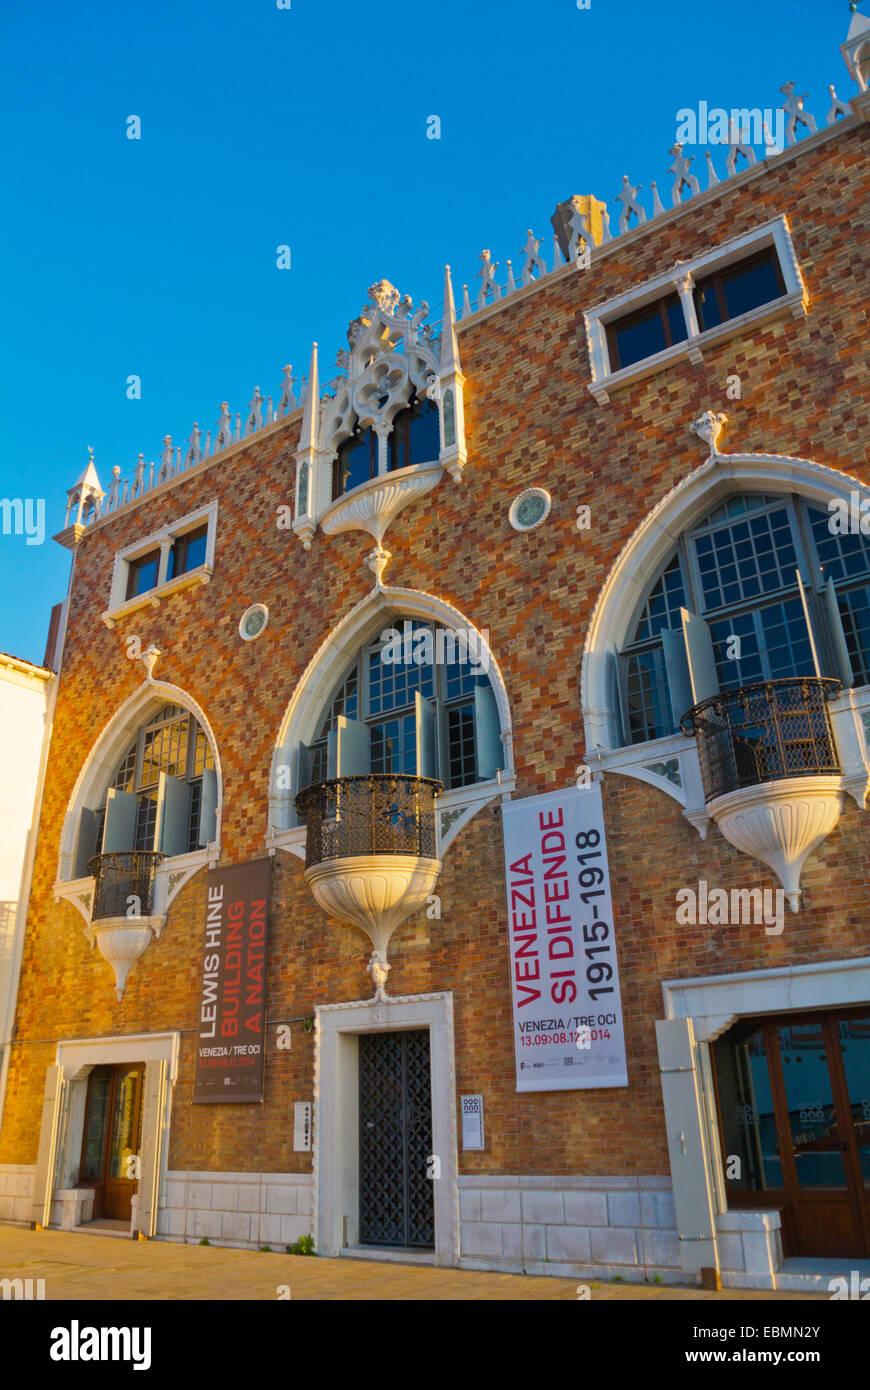 La Casa dei Tri Oci, entworfen von Mario de Maria, Kunstgalerie, Insel La Giudecca, Venedig, Italien Stockbild